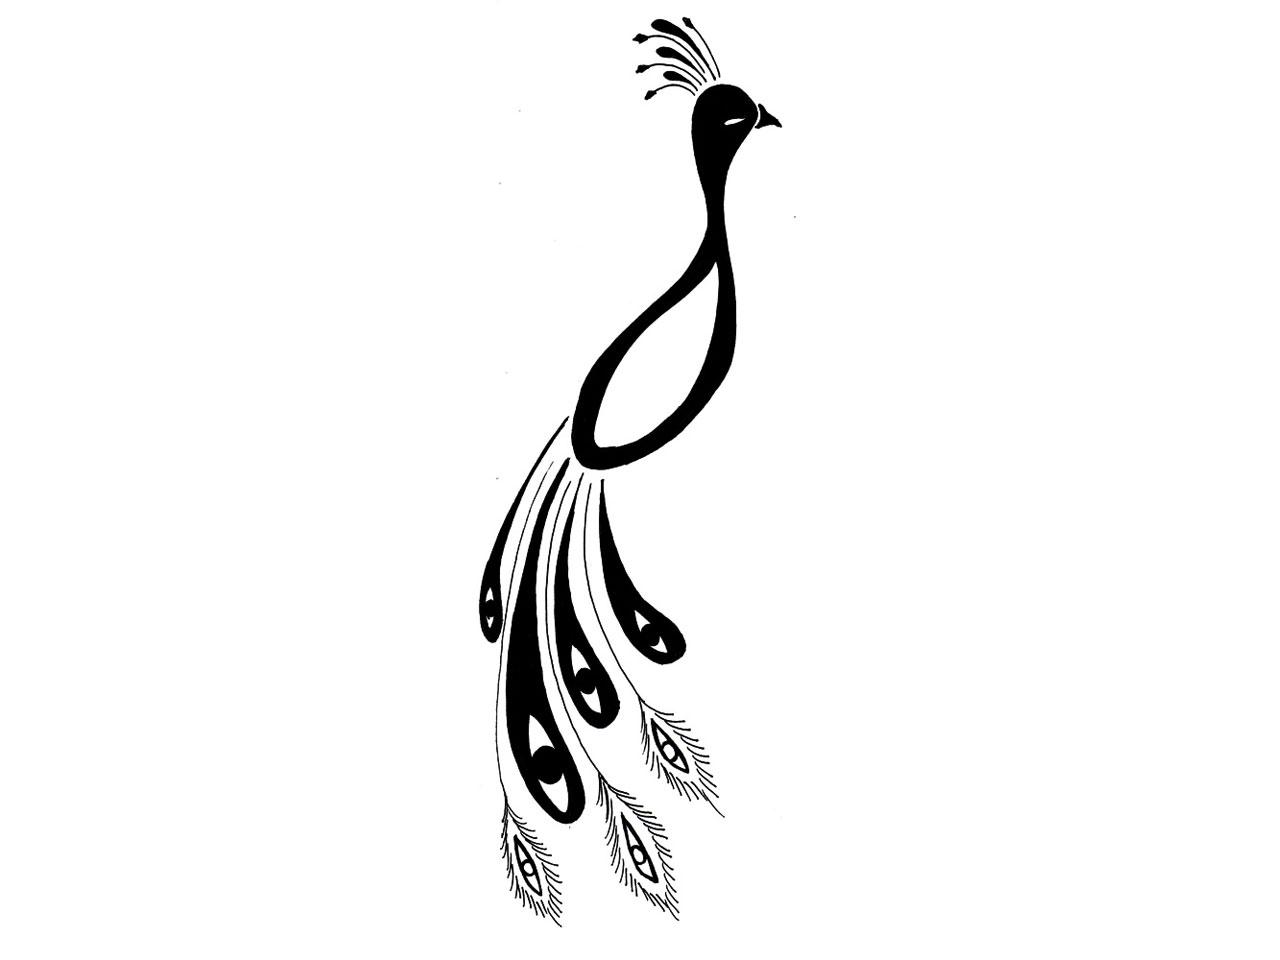 Peacock Vector Free Download